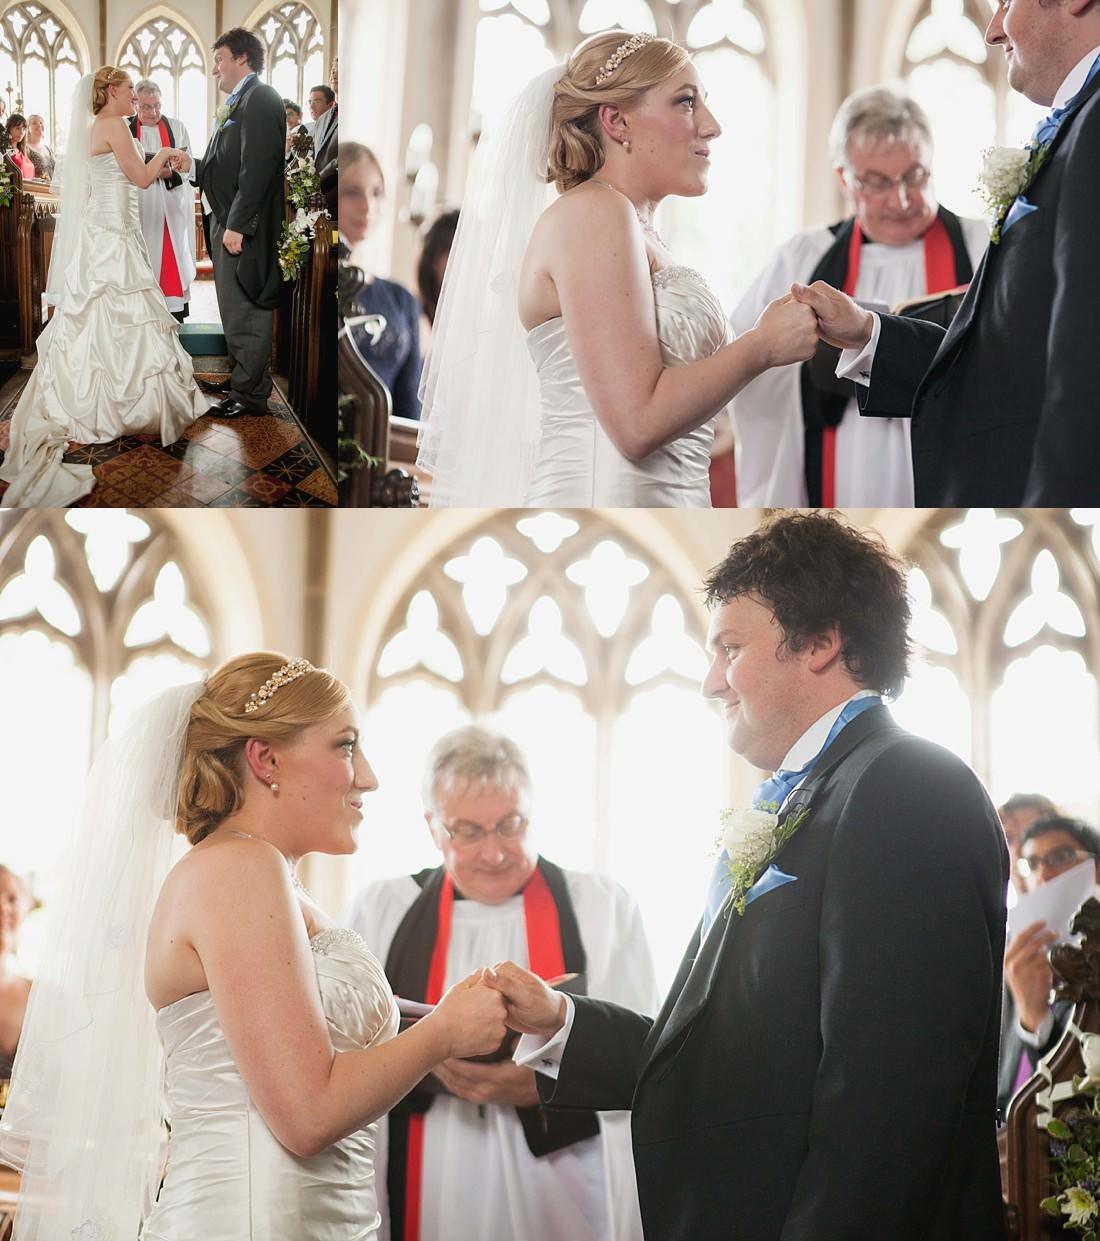 st nicholas church moreton wedding dorset weddings